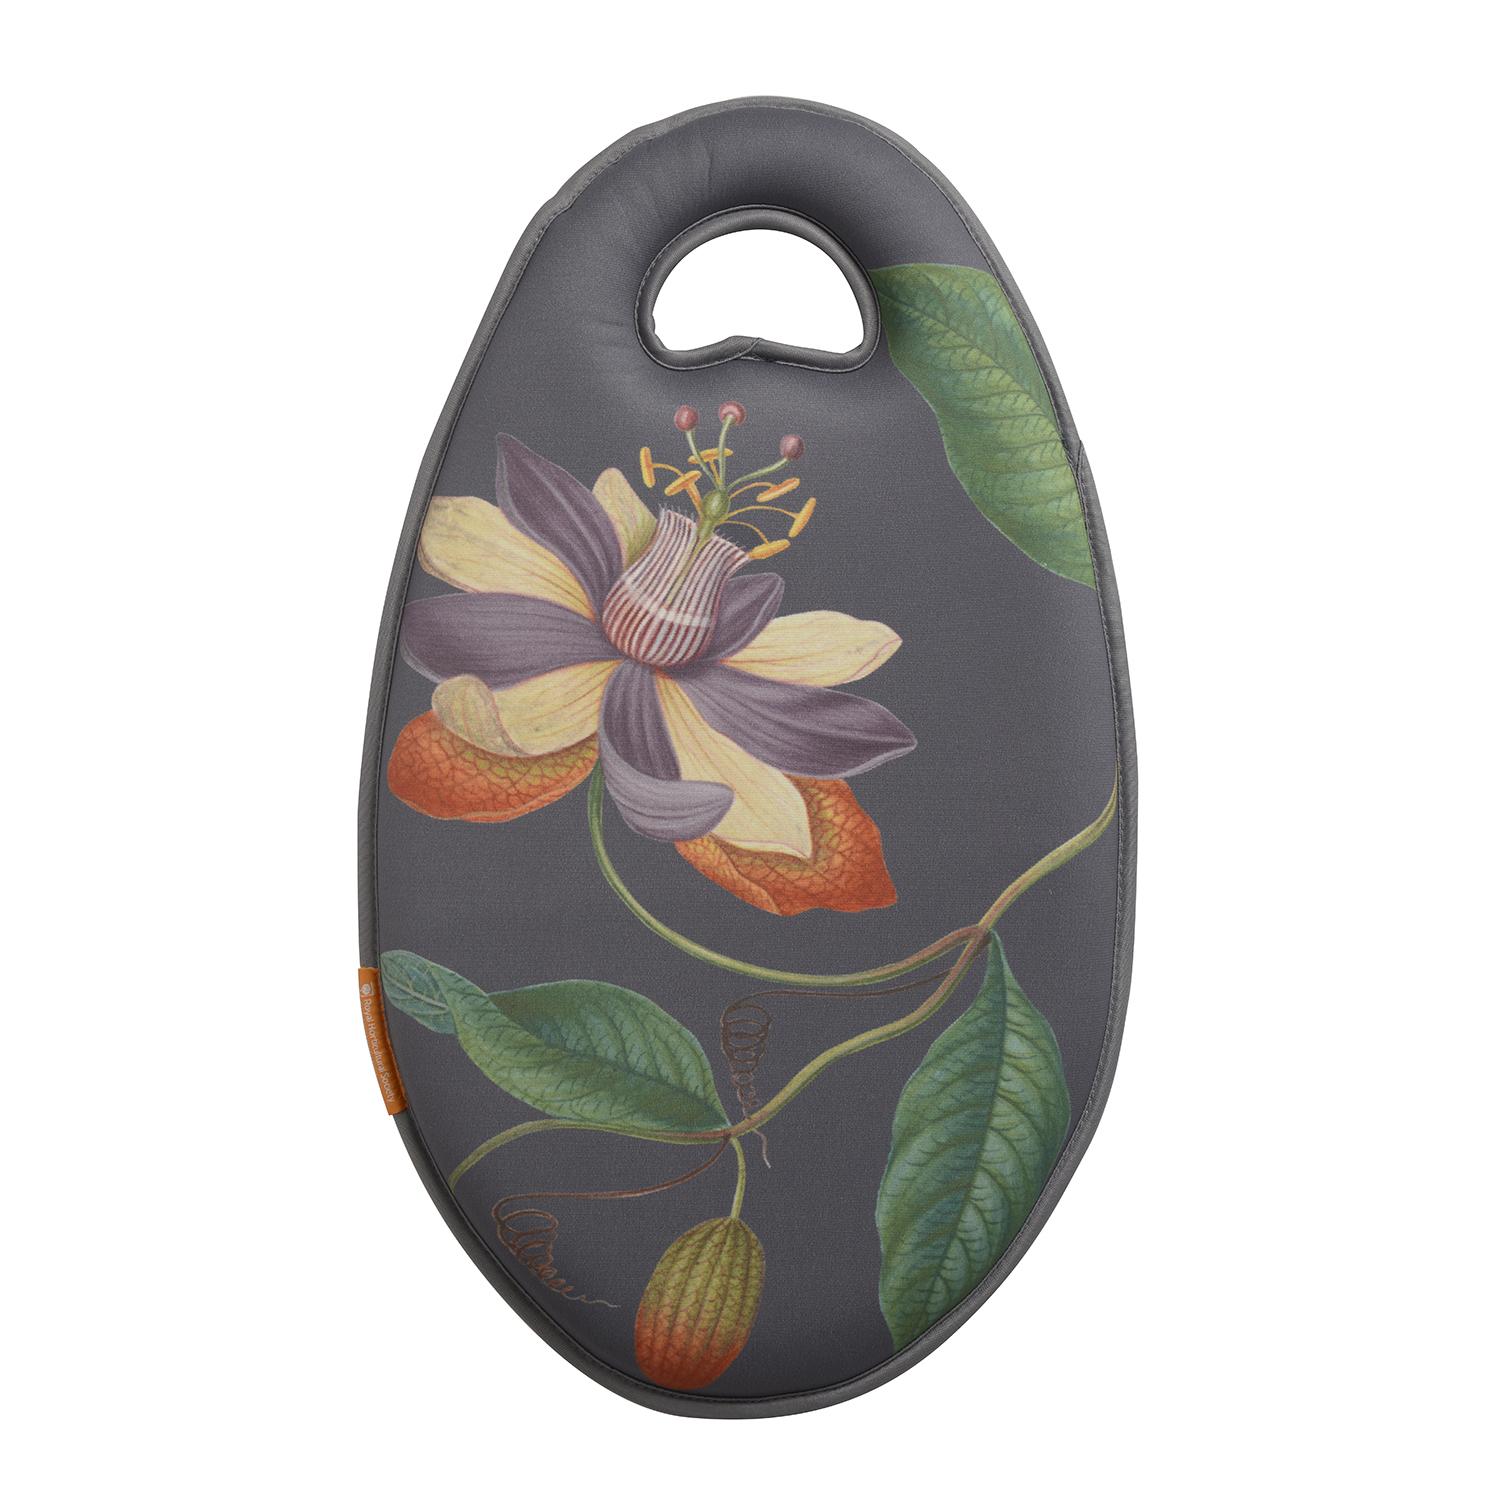 Burgon & Ball – RHS Passiflora Kneelo® Kneeler